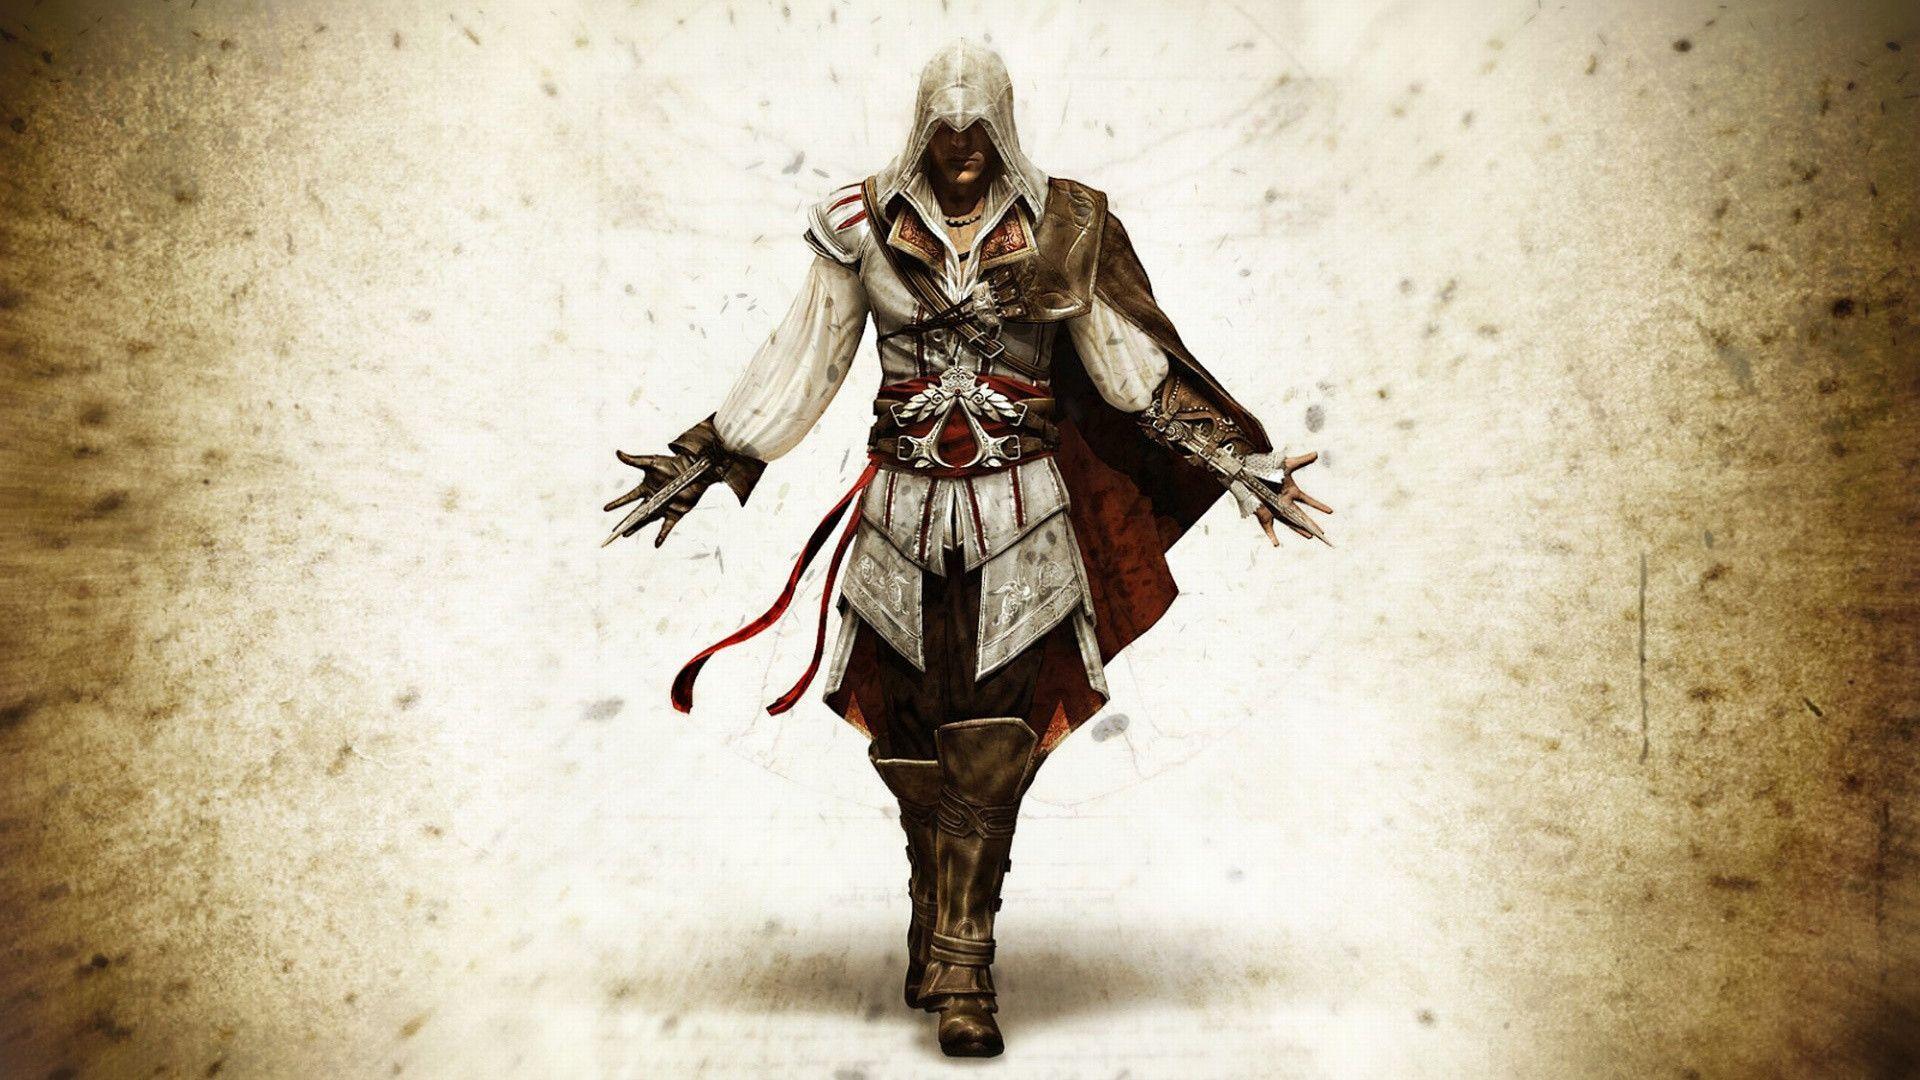 assassin creed warpaper assasin creed wallpaper hd Wallpaper HD Image 18073